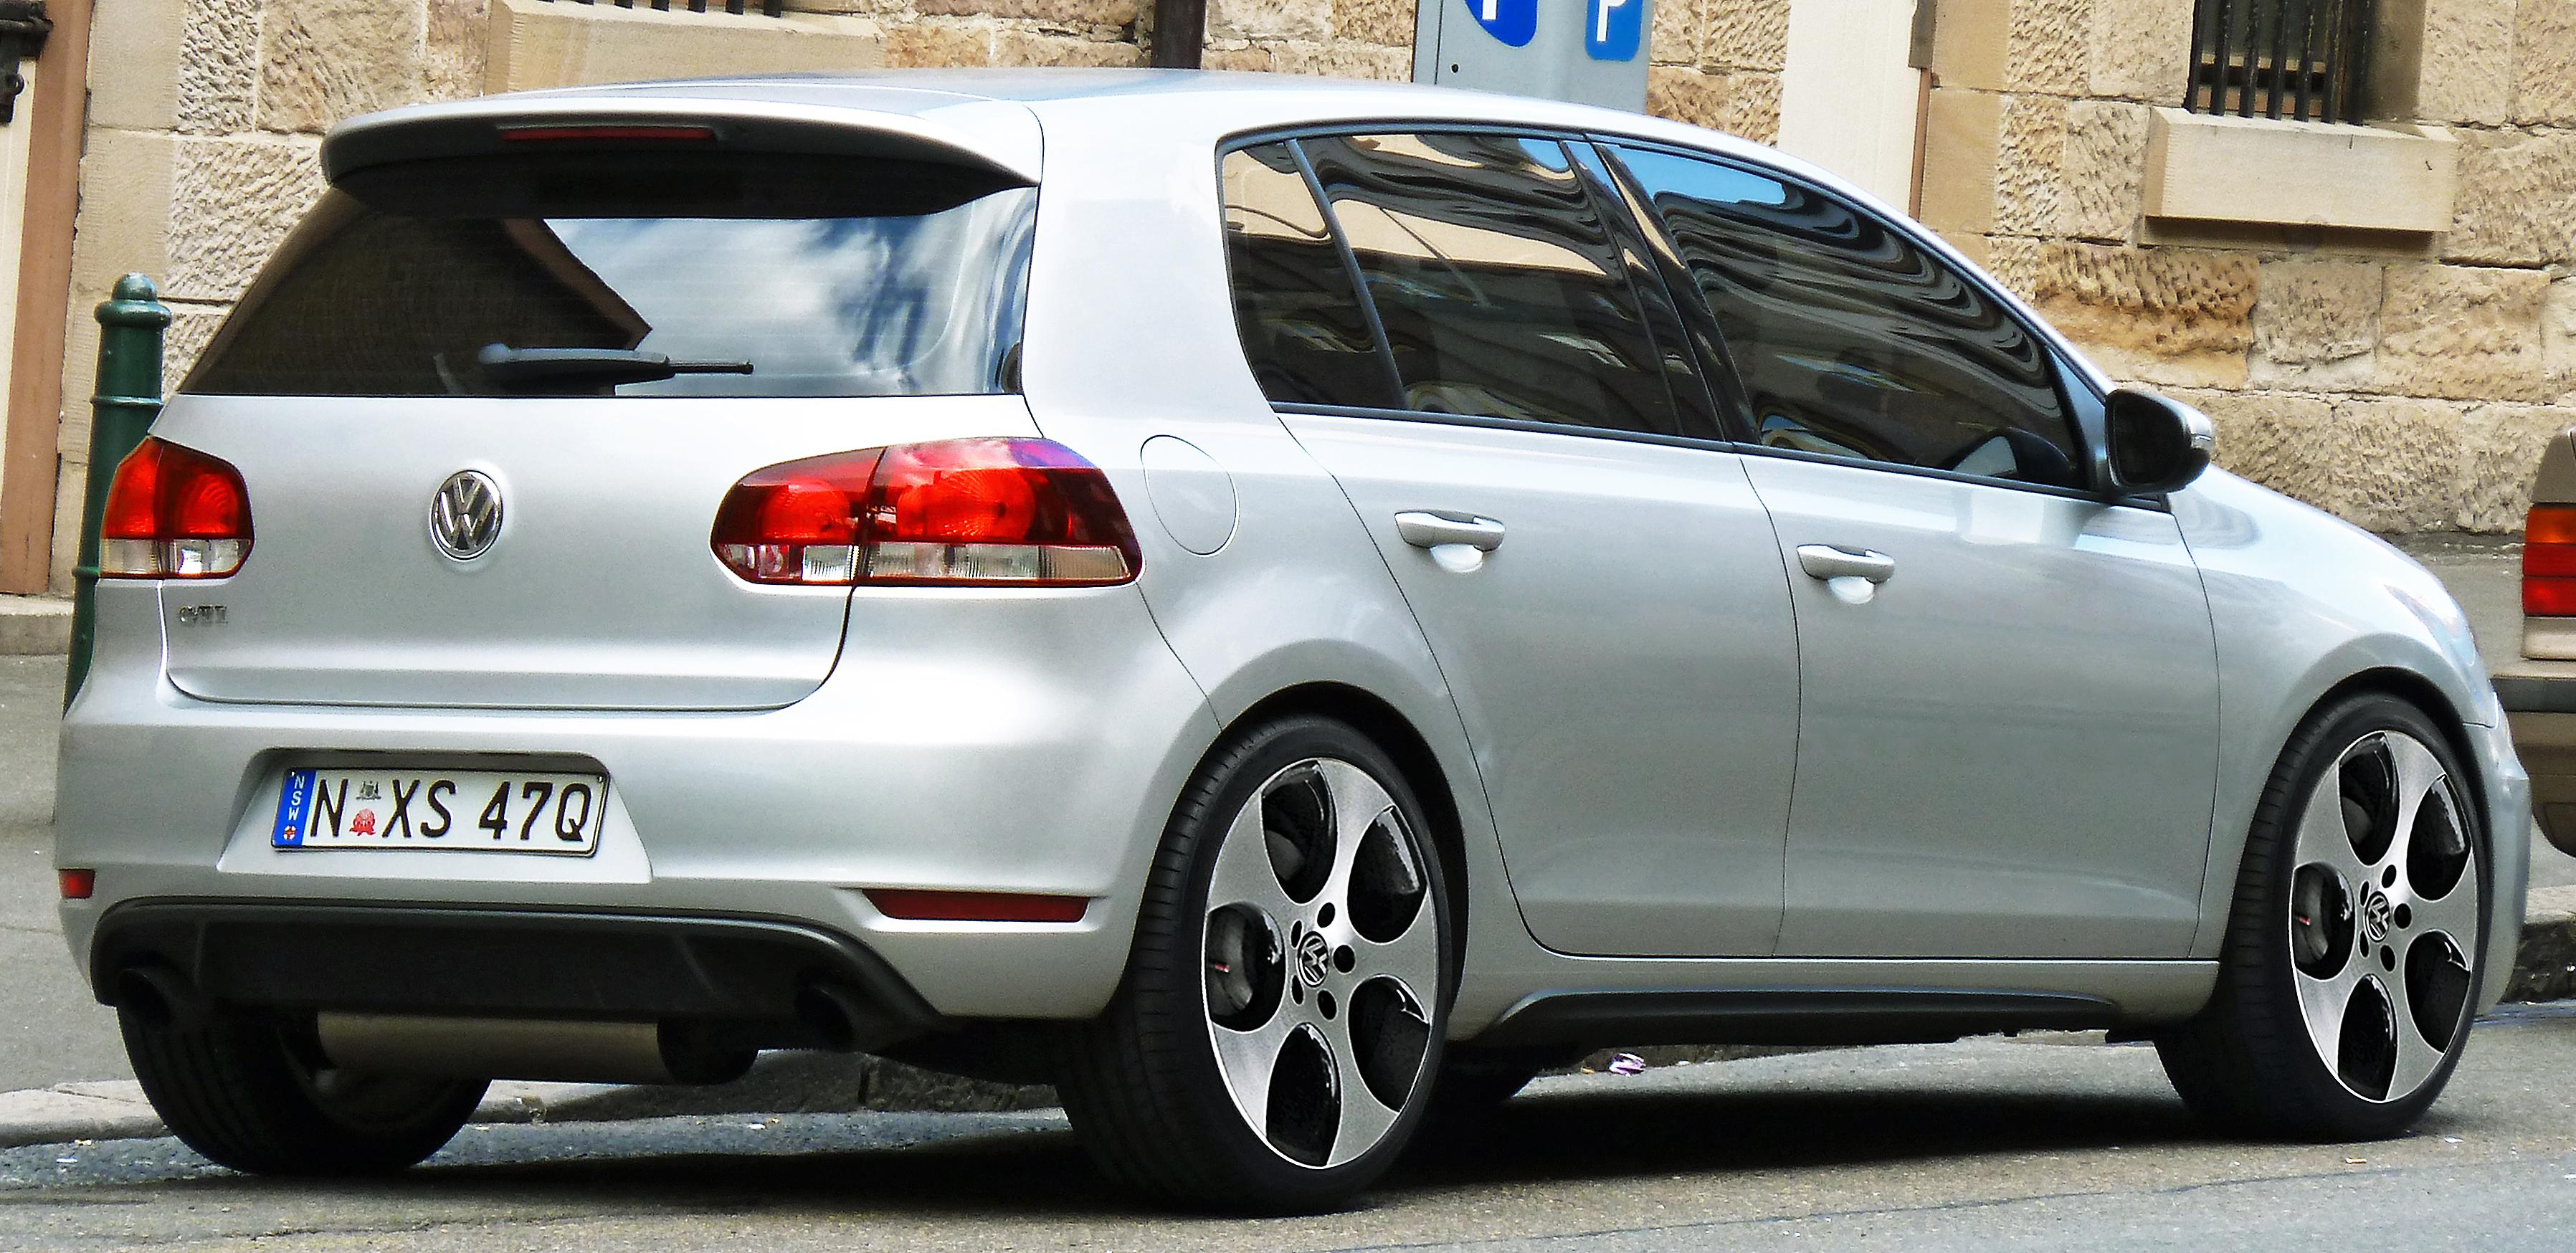 file 2009 2011 volkswagen golf 5k gti 5 door hatchback 2011 10 31 wikimedia commons. Black Bedroom Furniture Sets. Home Design Ideas